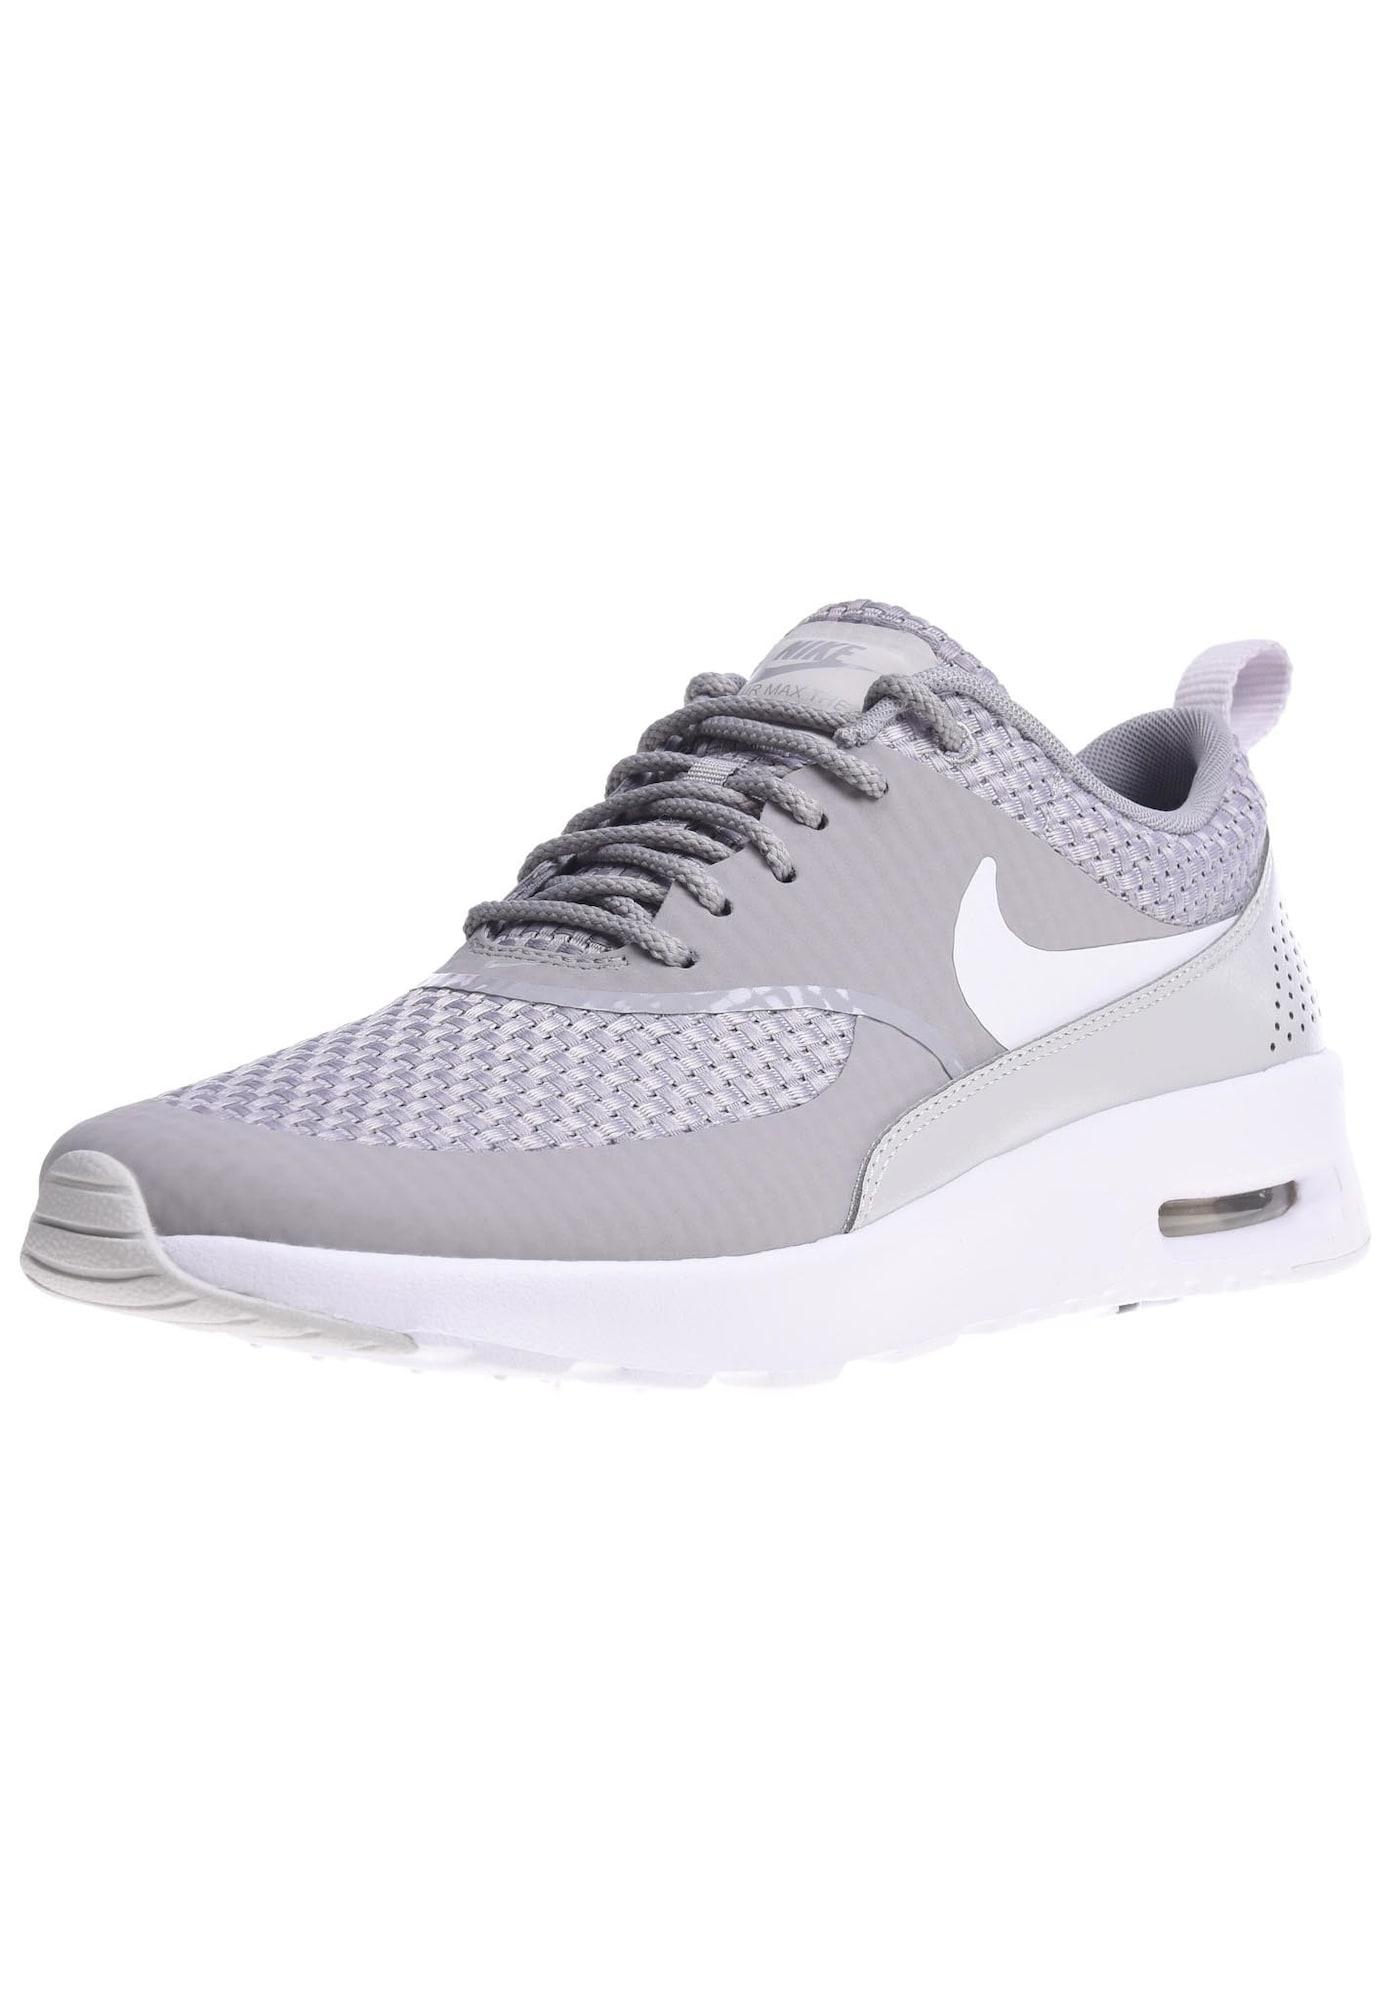 Nike Sportswear, Dames Sneakers laag 'Air Max Thea Premium', grijs